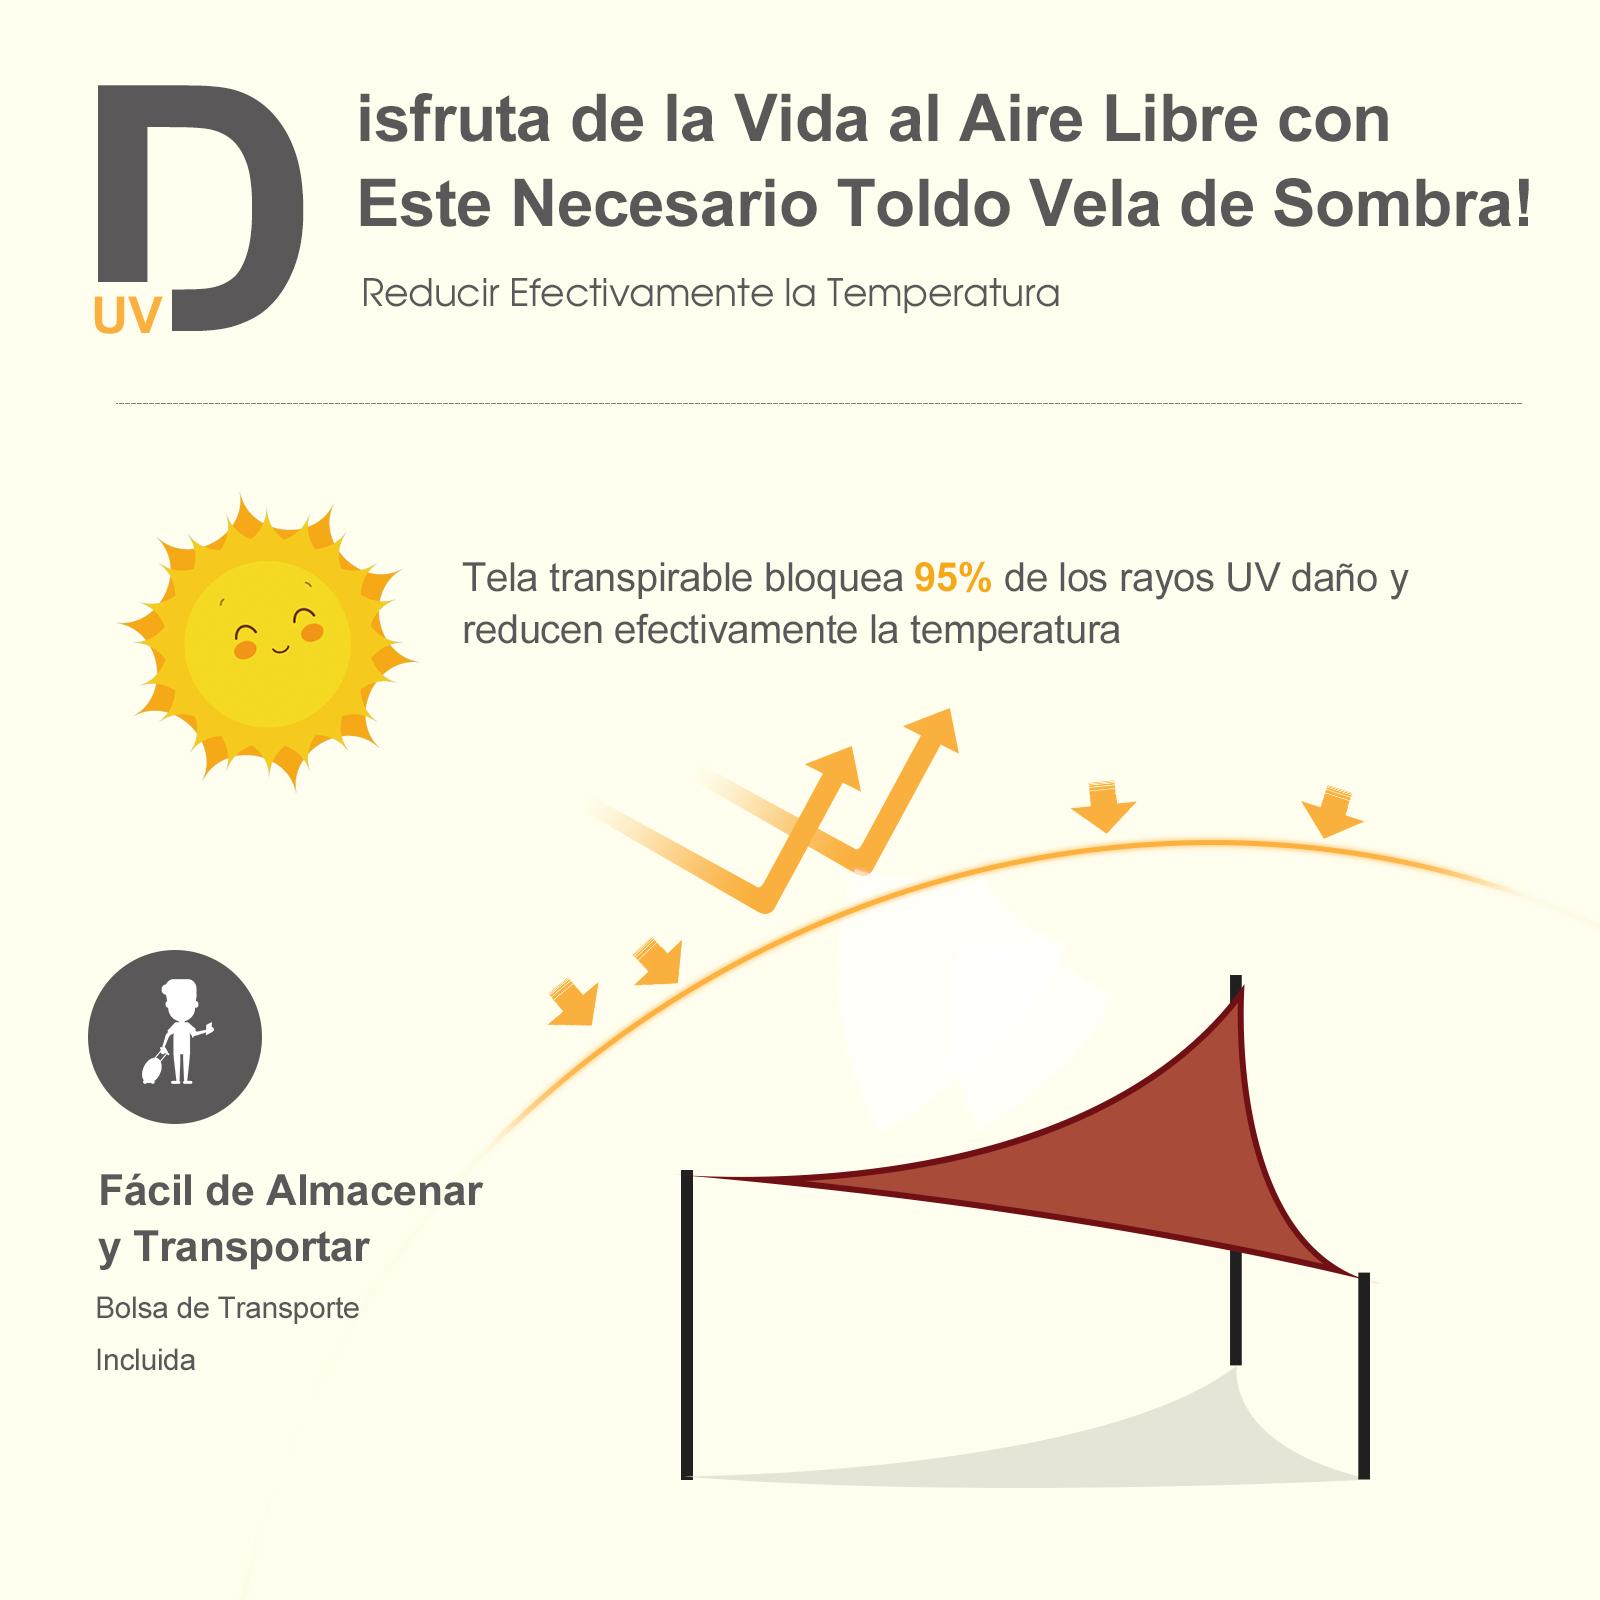 Toldo-Vela-Sombrilla-Parasol-Triangulo-Tejido-de-Poliester-185-g-m-Jardin-Playa miniatura 25